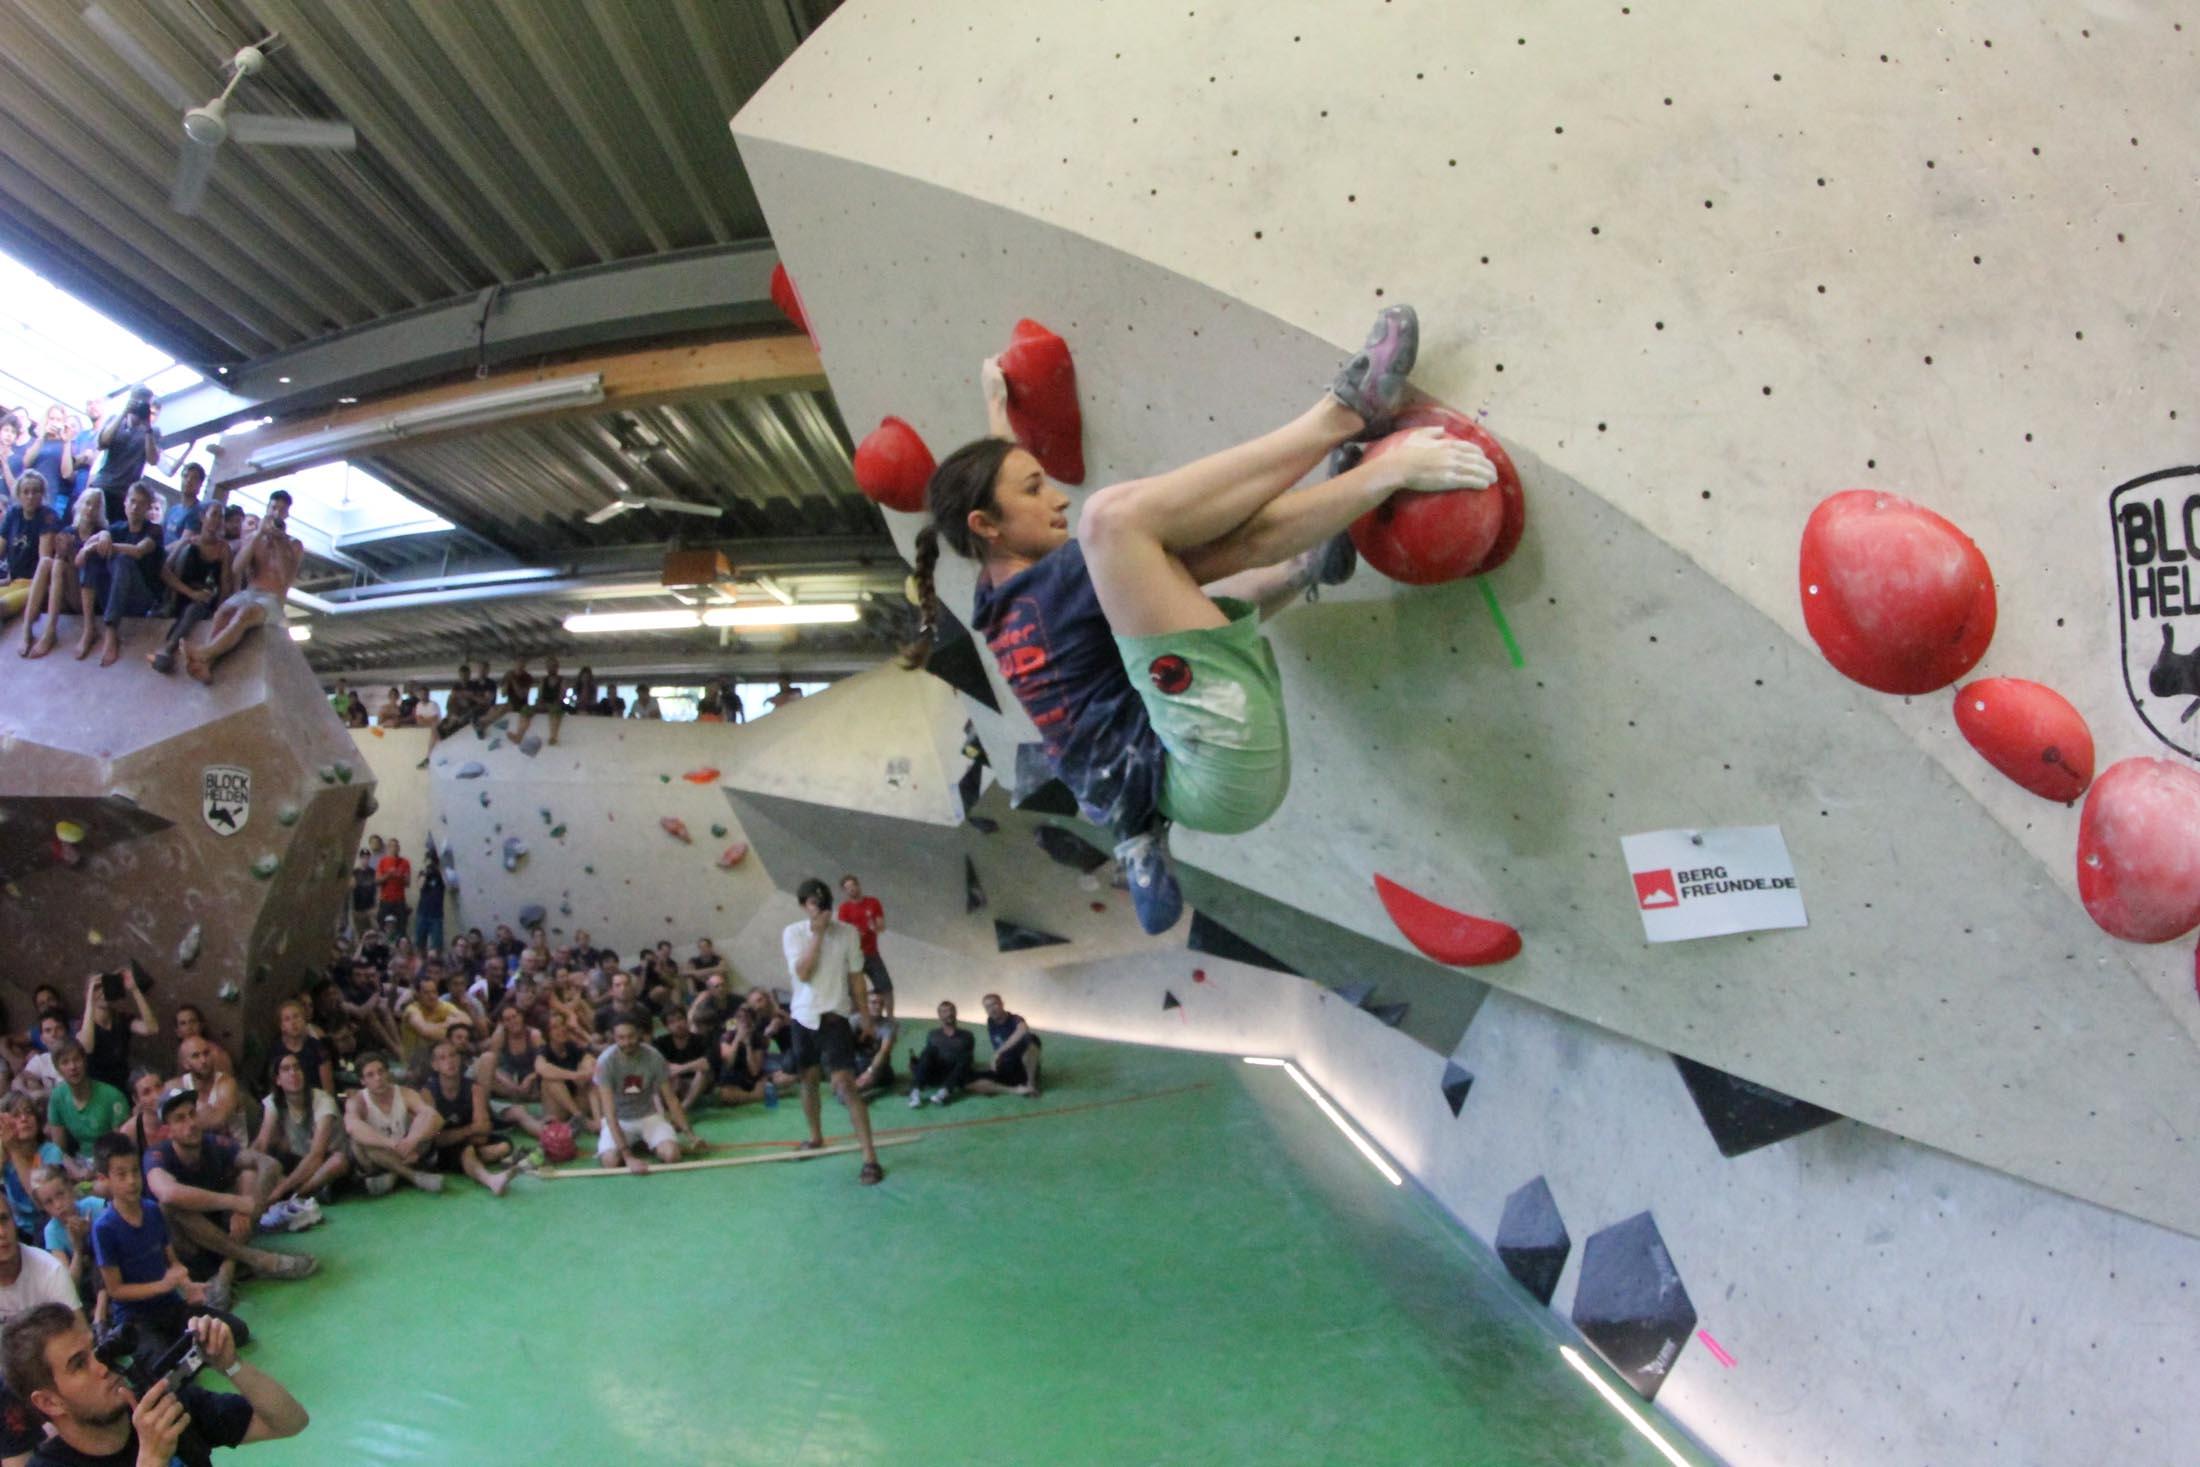 Juliane Wurm, internationaler bouldercup Frankenjura, BLOCKHELDEN Erlangen, Bergfreunde.de, Mammut07092016041